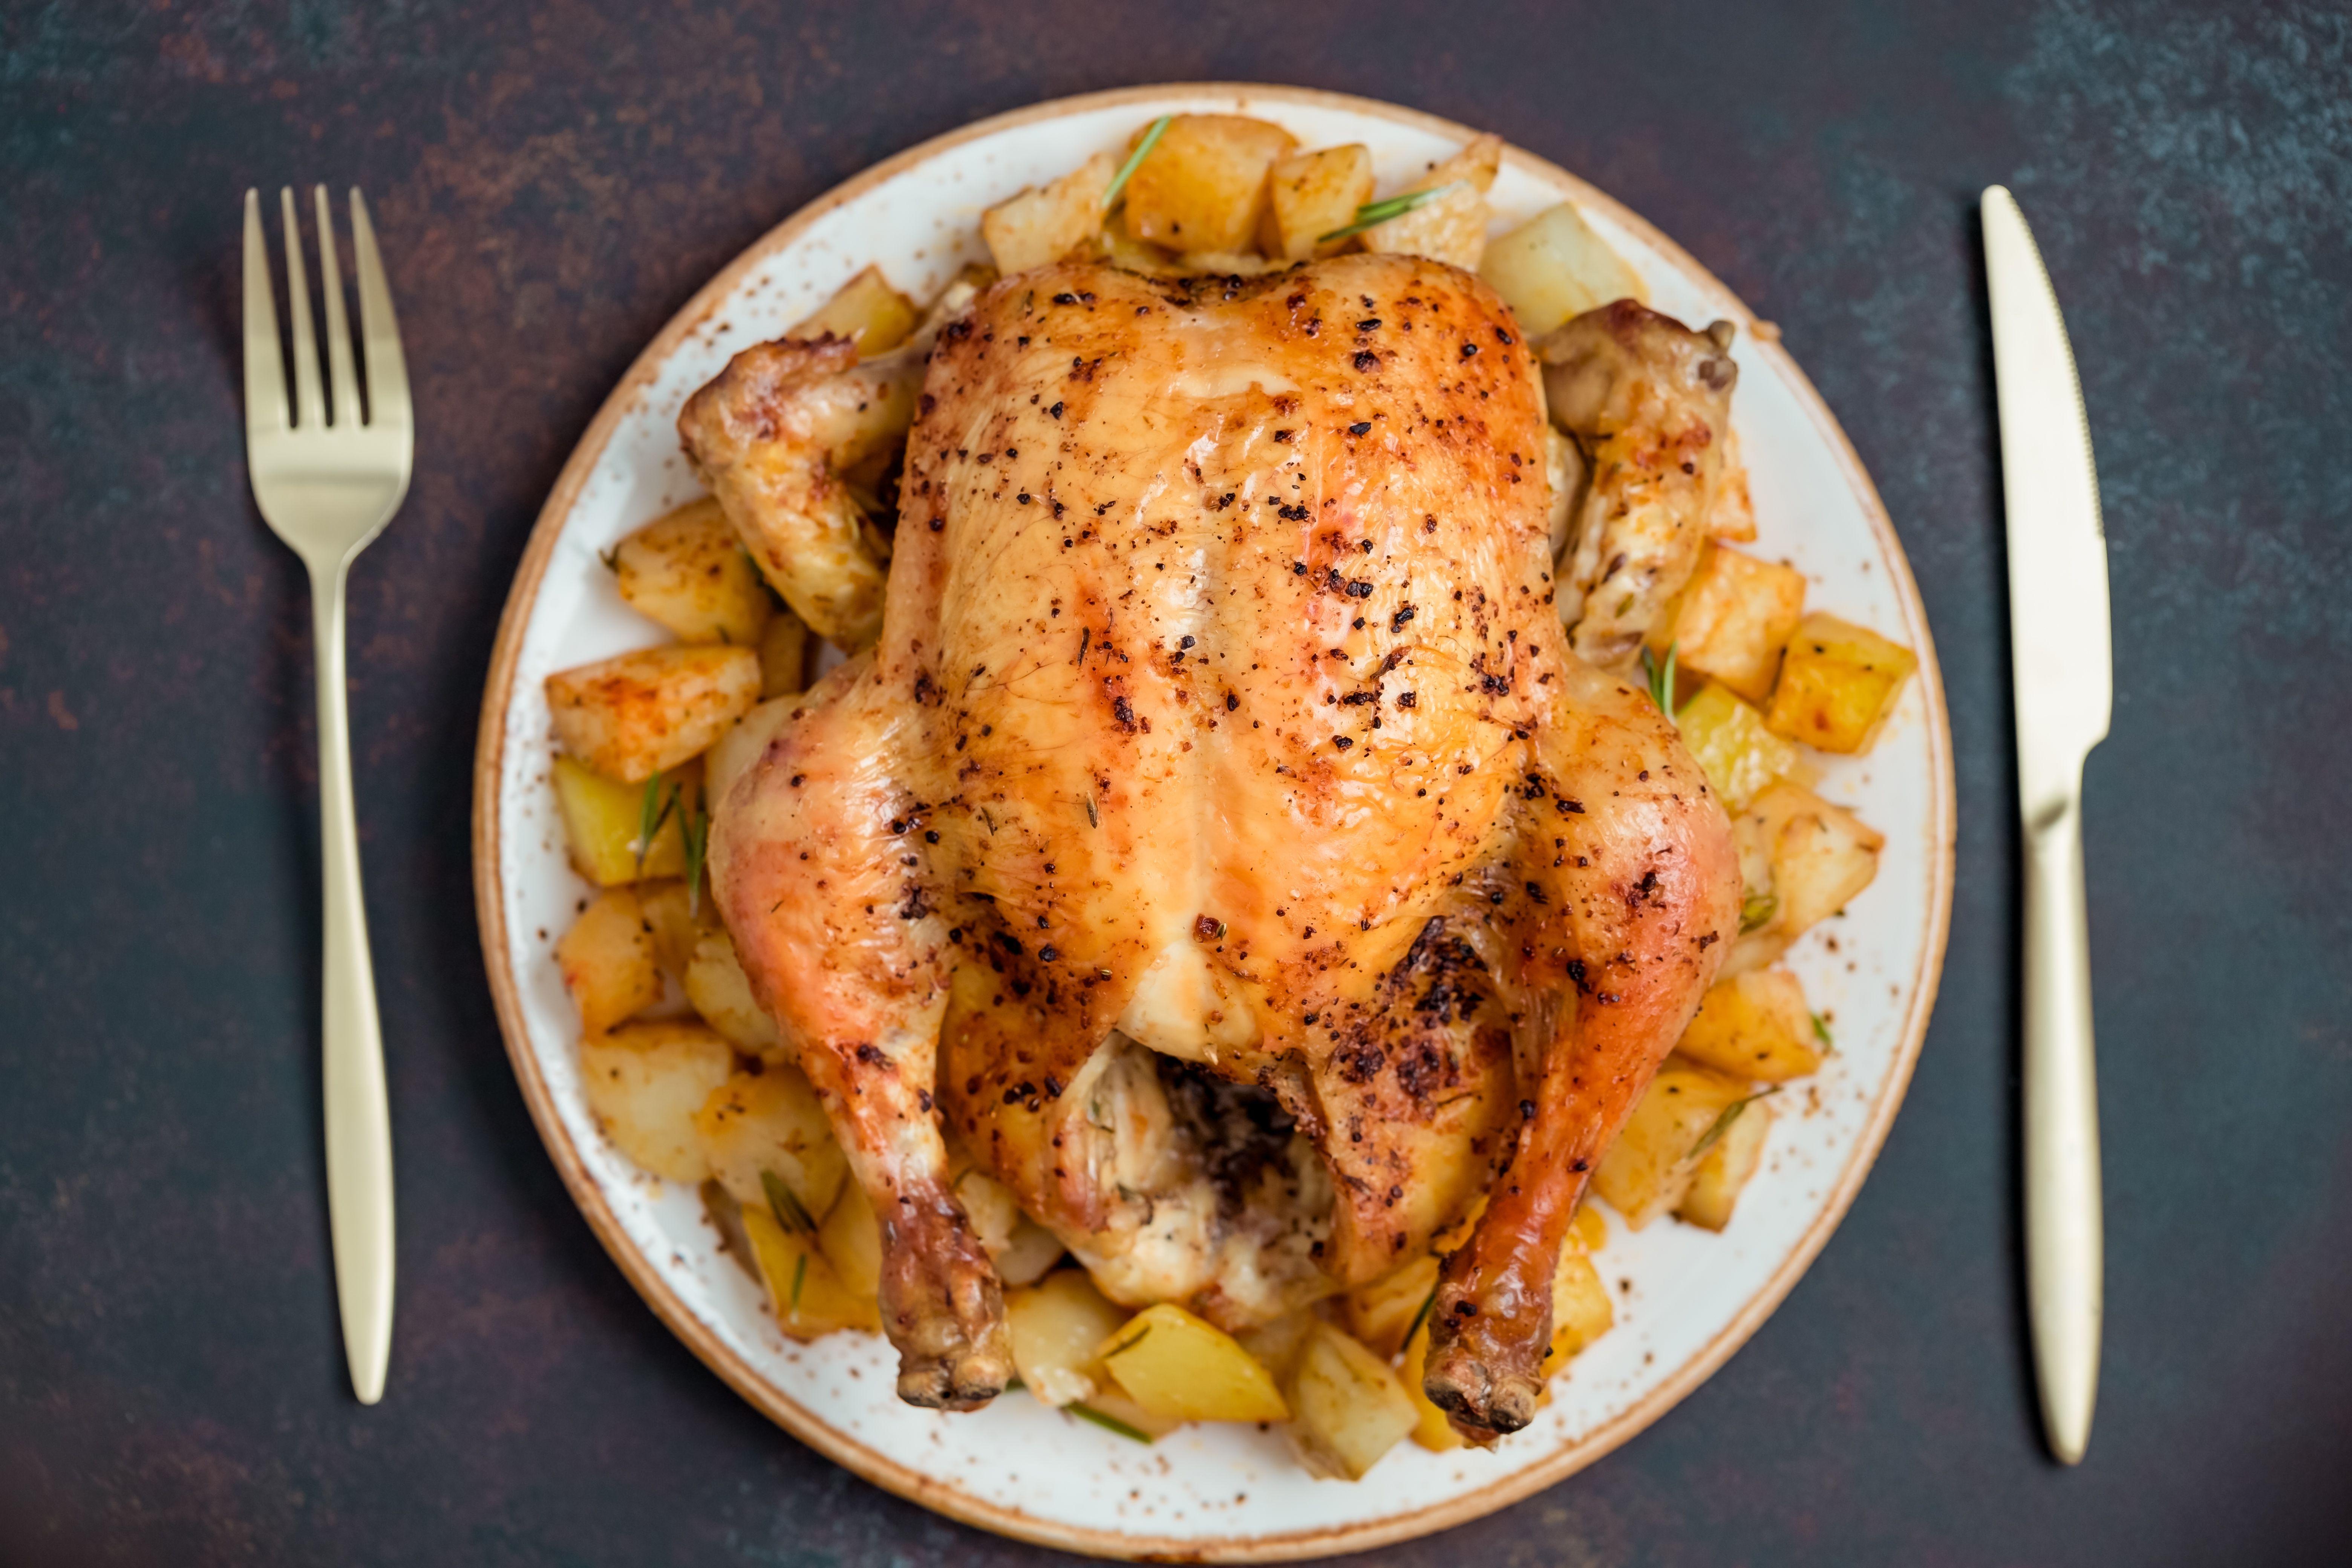 Iron skillet roast chicken